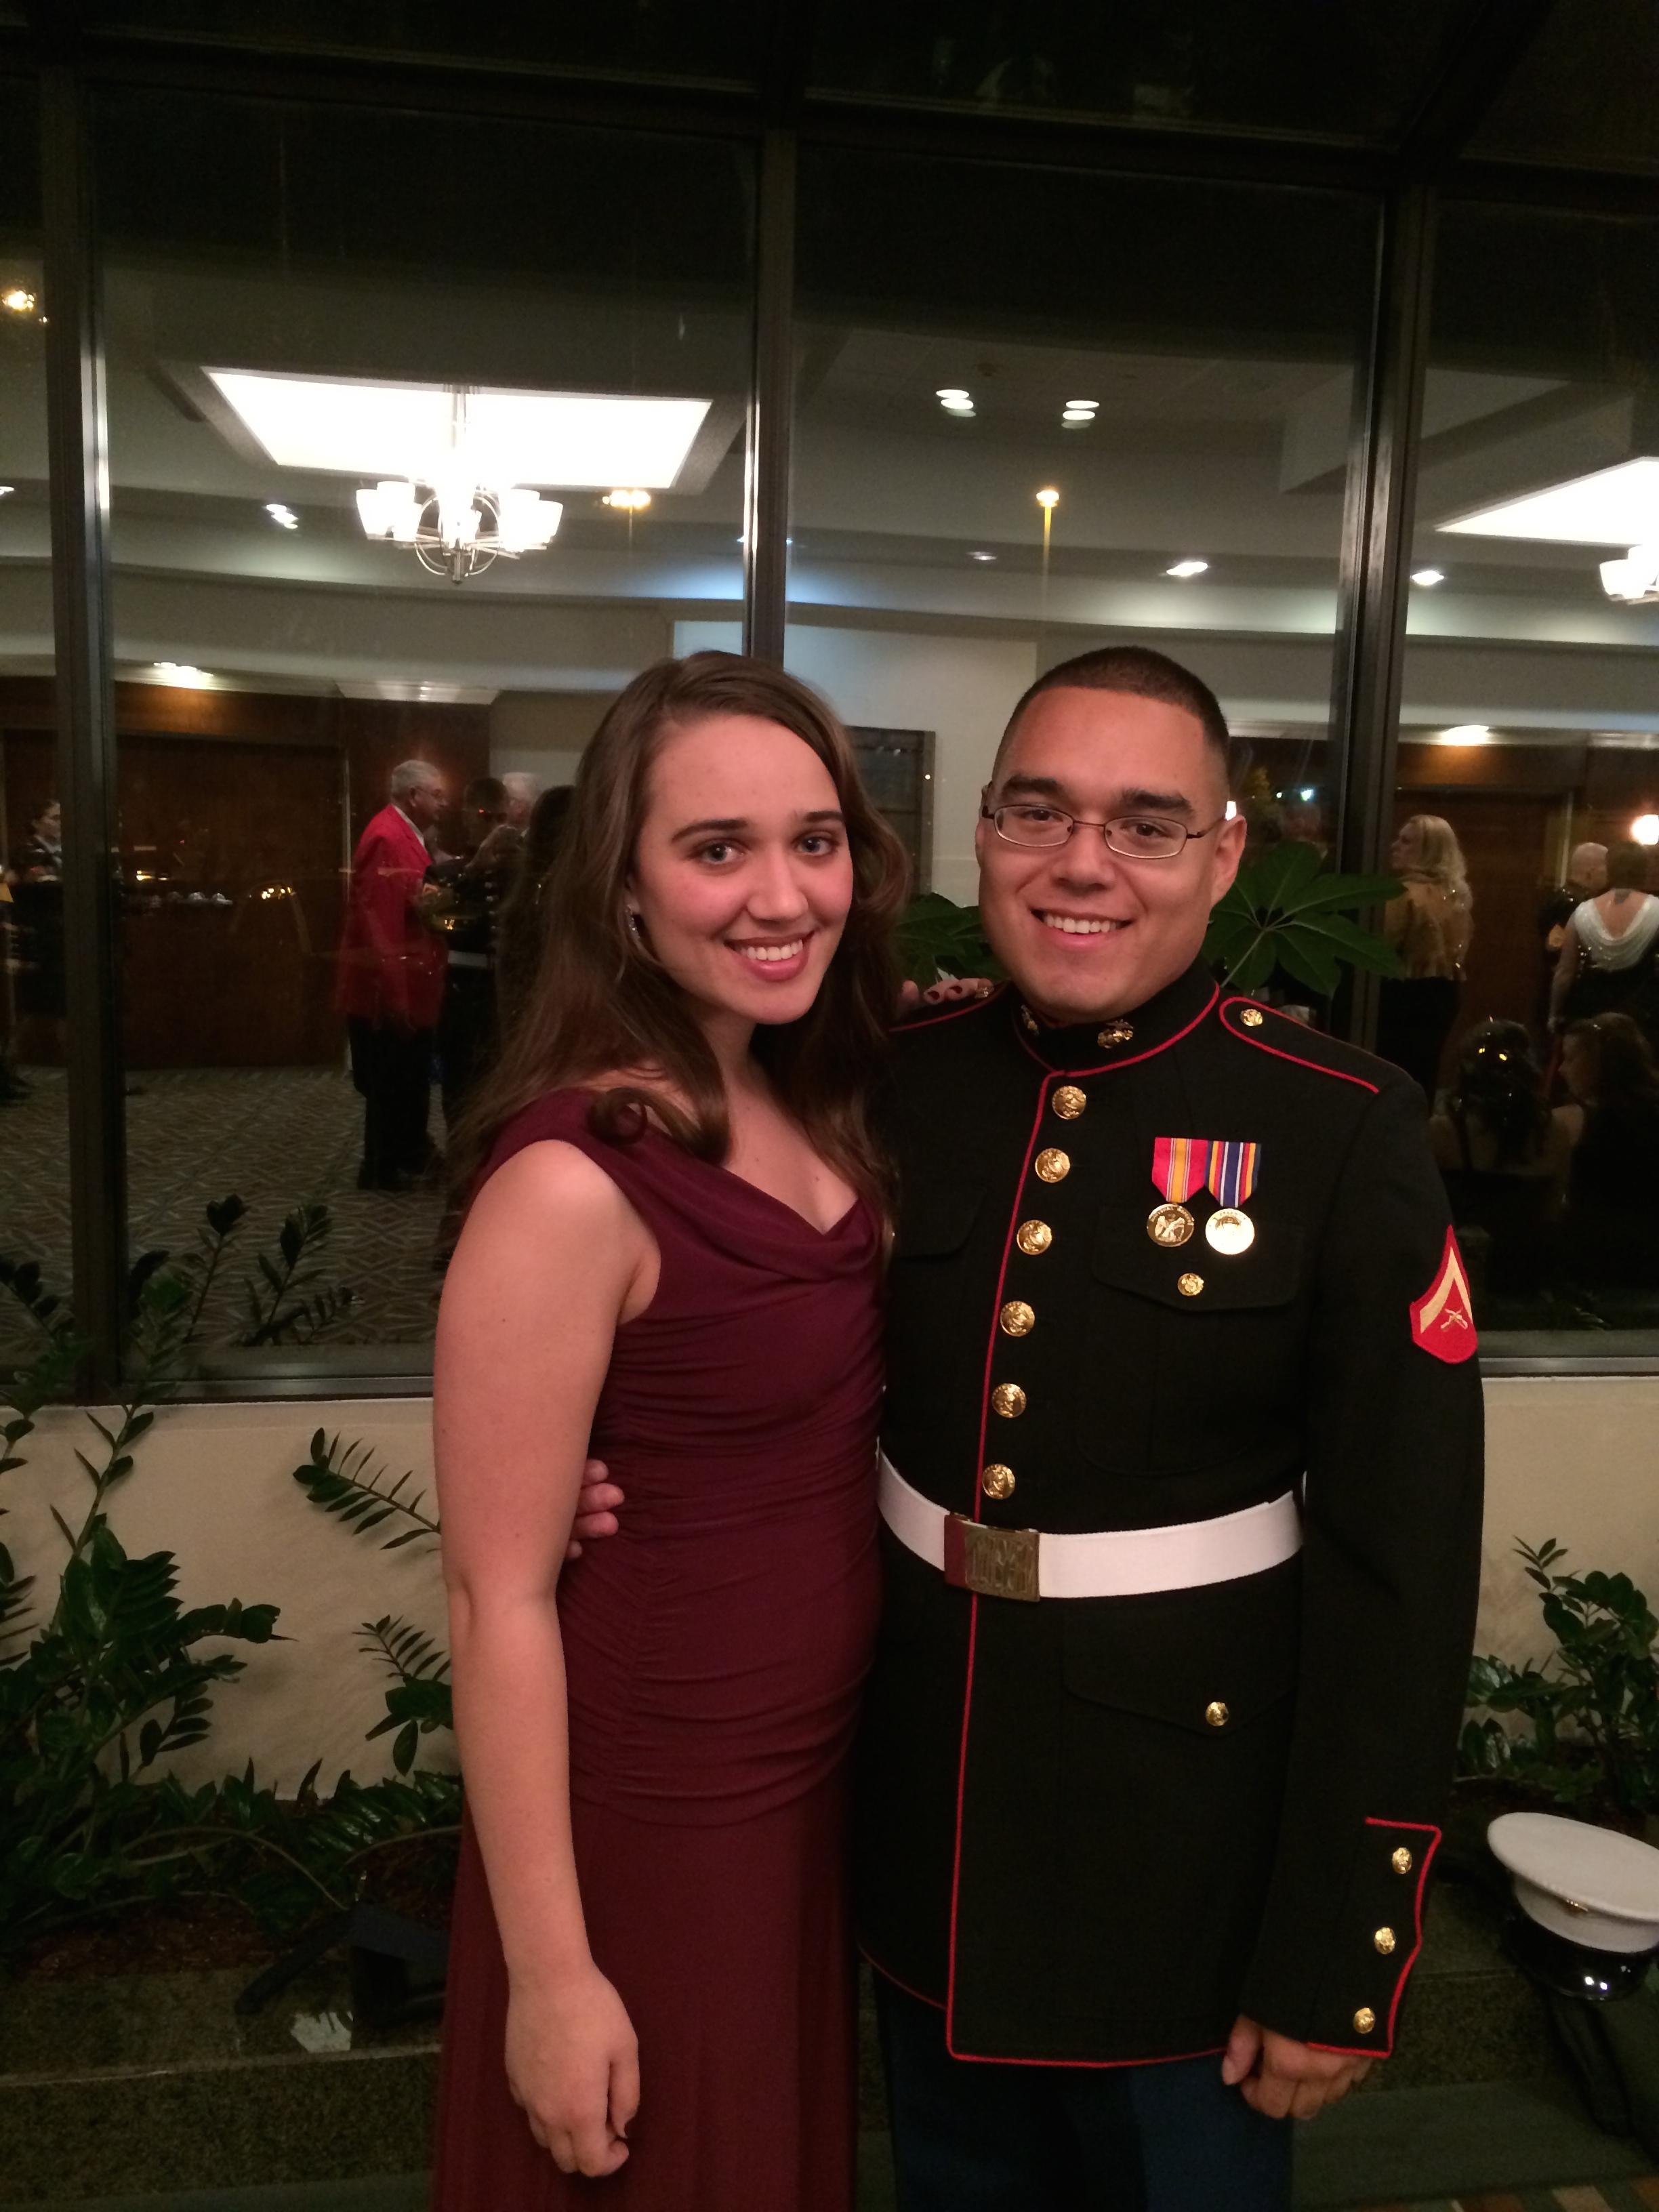 November 2013, Augusta, Georgia. Our first Marine Corps Ball.